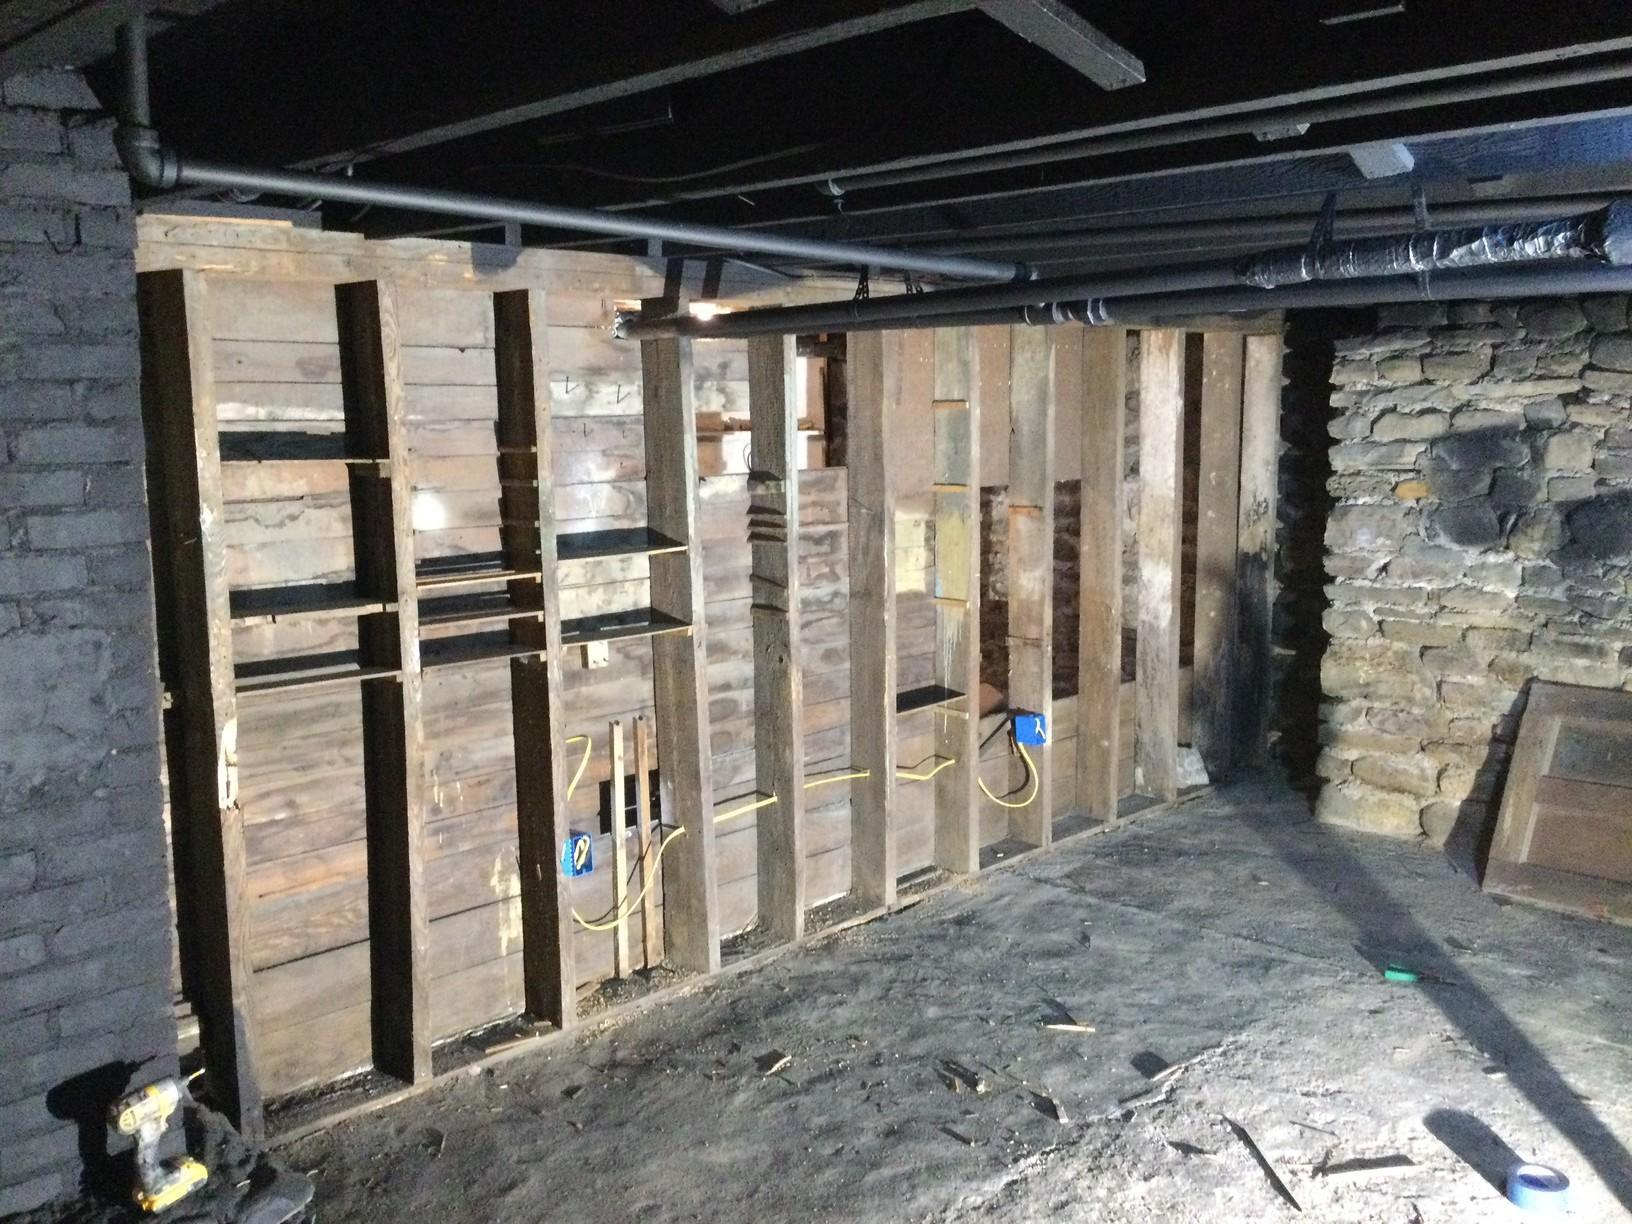 Day 1 - The Original Walls